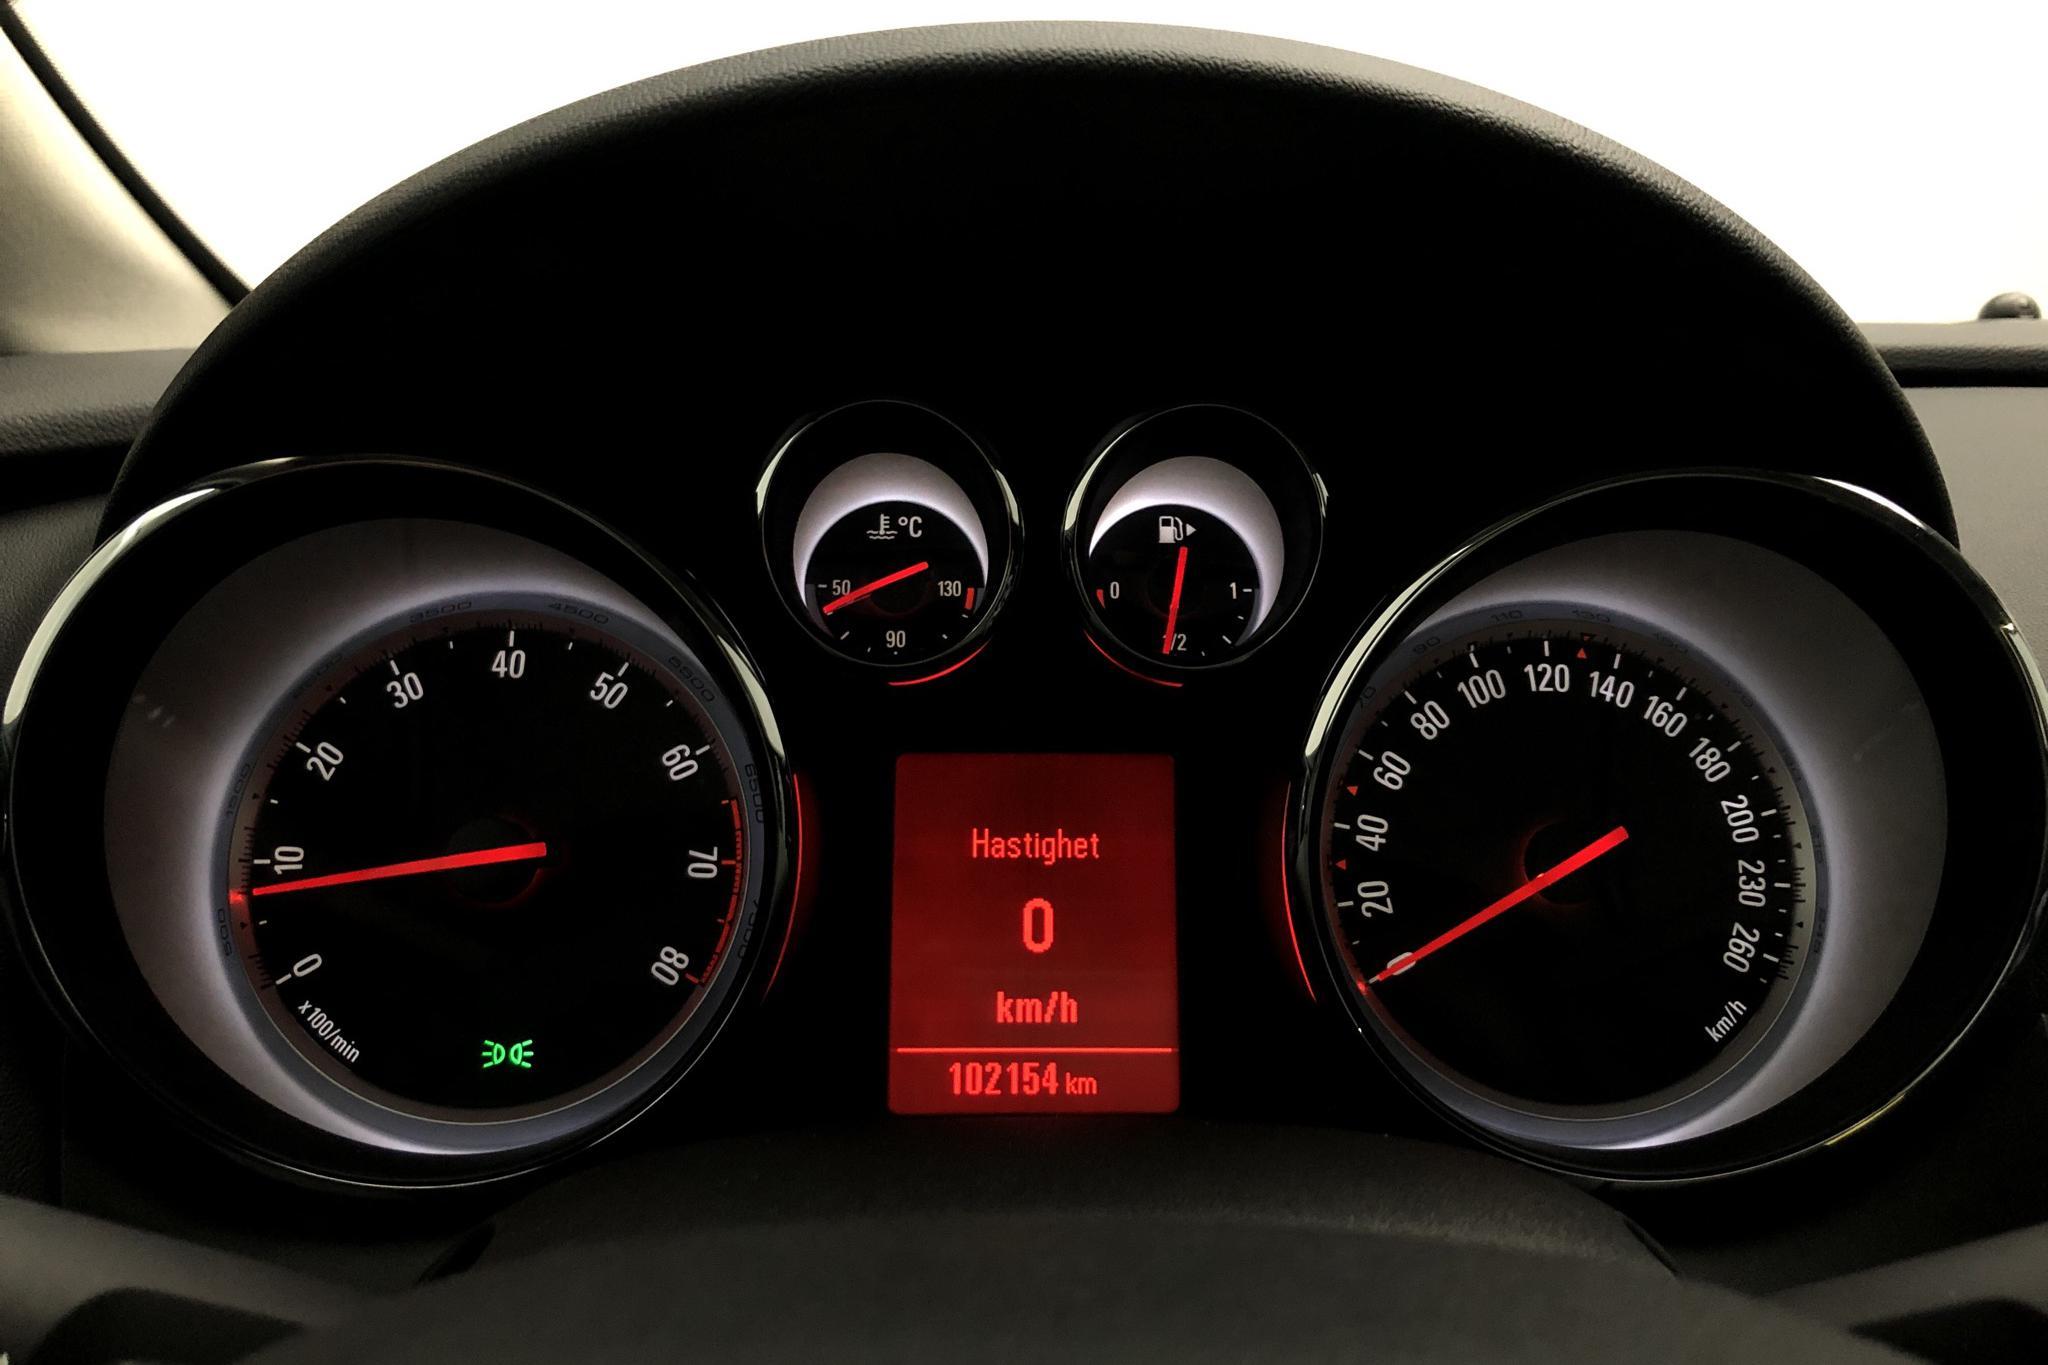 Opel Astra 1.6 ECOTEC 5dr (115hk) - 10 215 mil - Manuell - brun - 2014